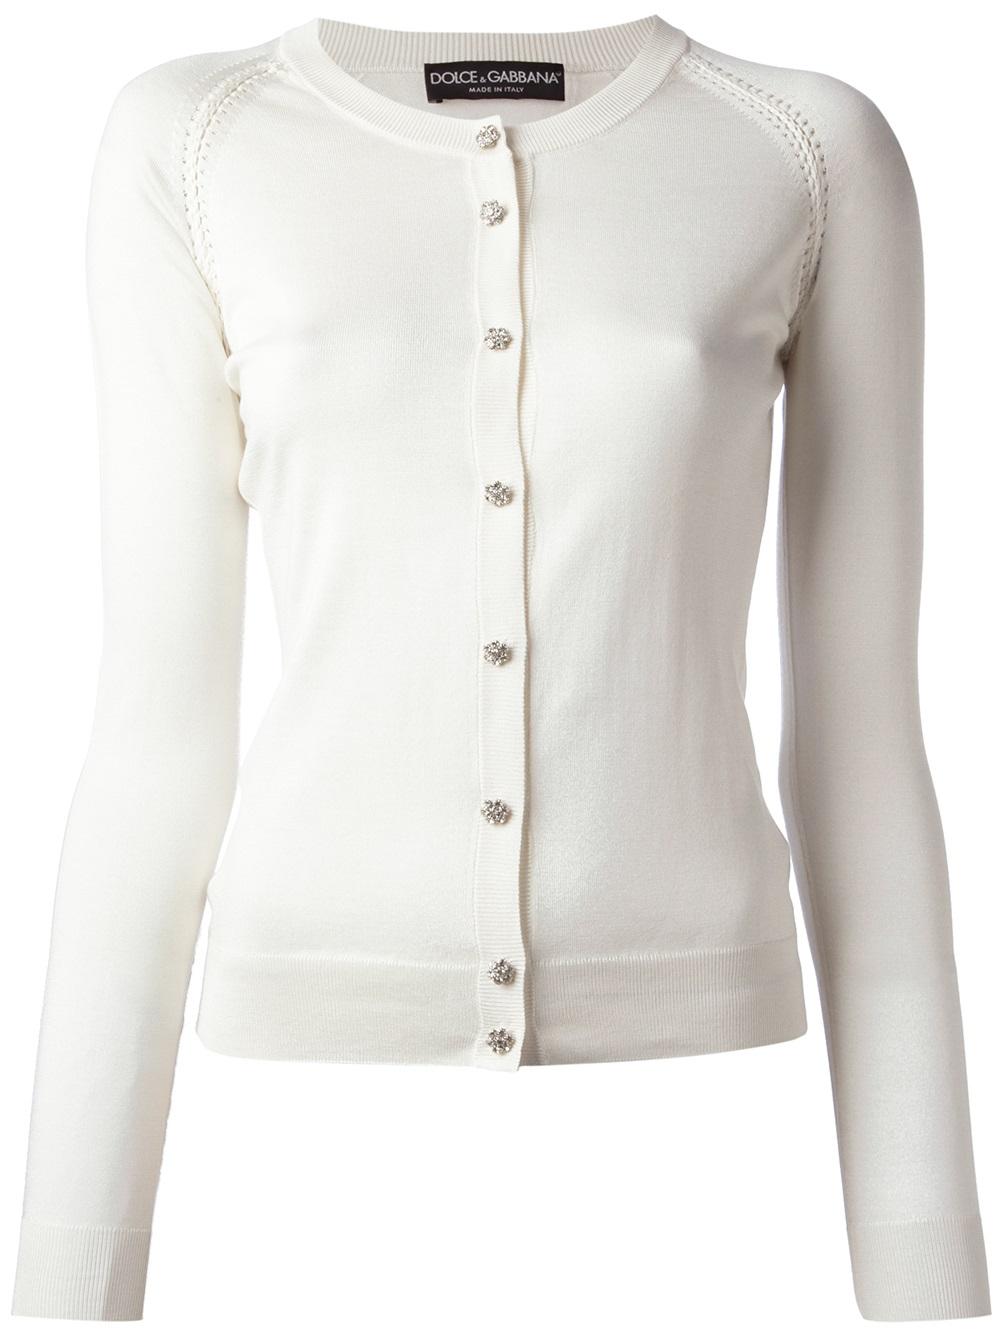 Dolce & gabbana Jewel Button Cardigan in White | Lyst